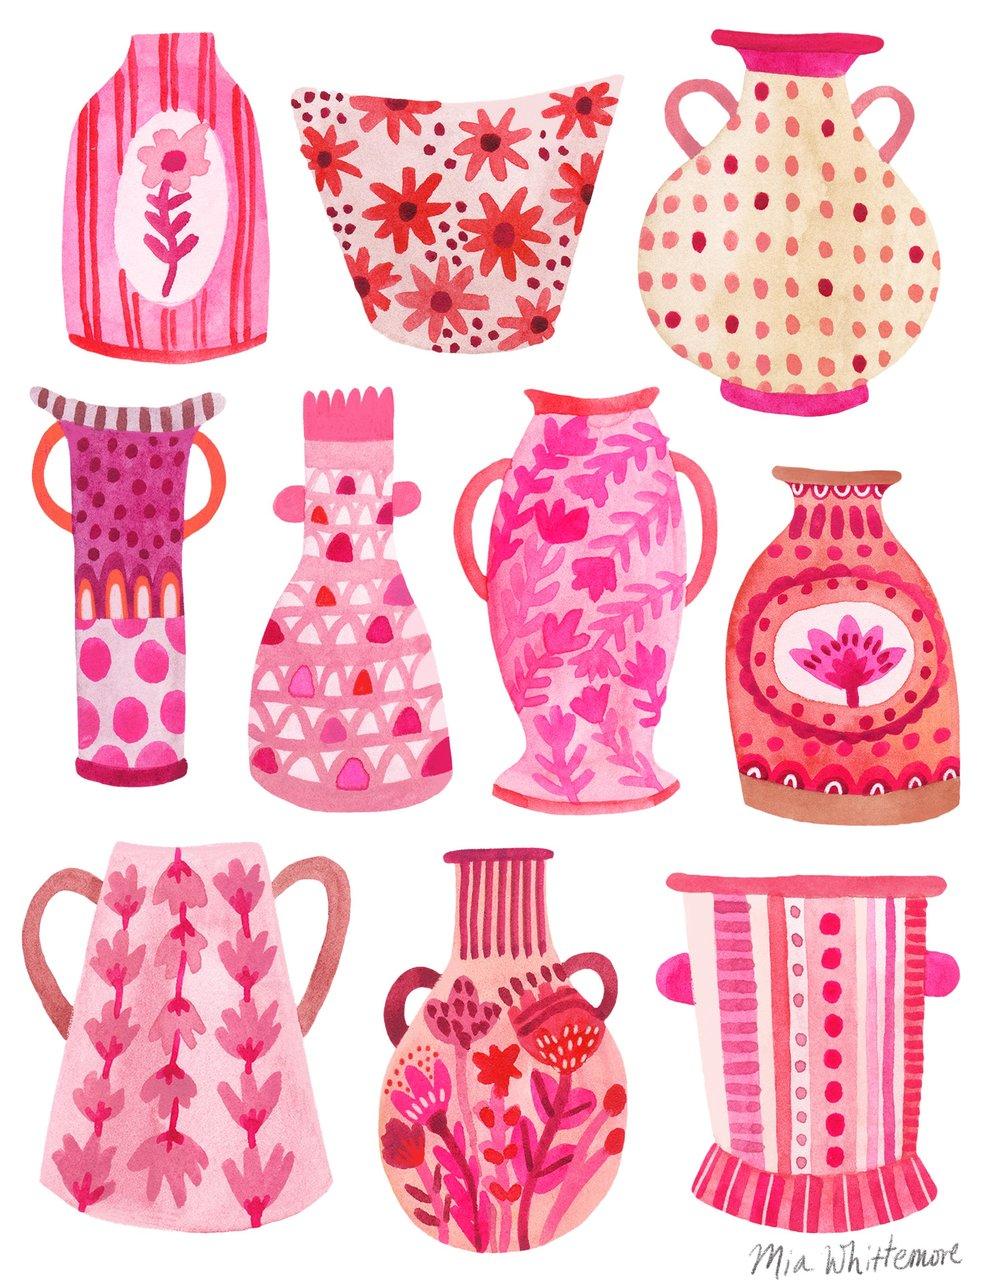 Mia Whittemore_pink vases.jpg